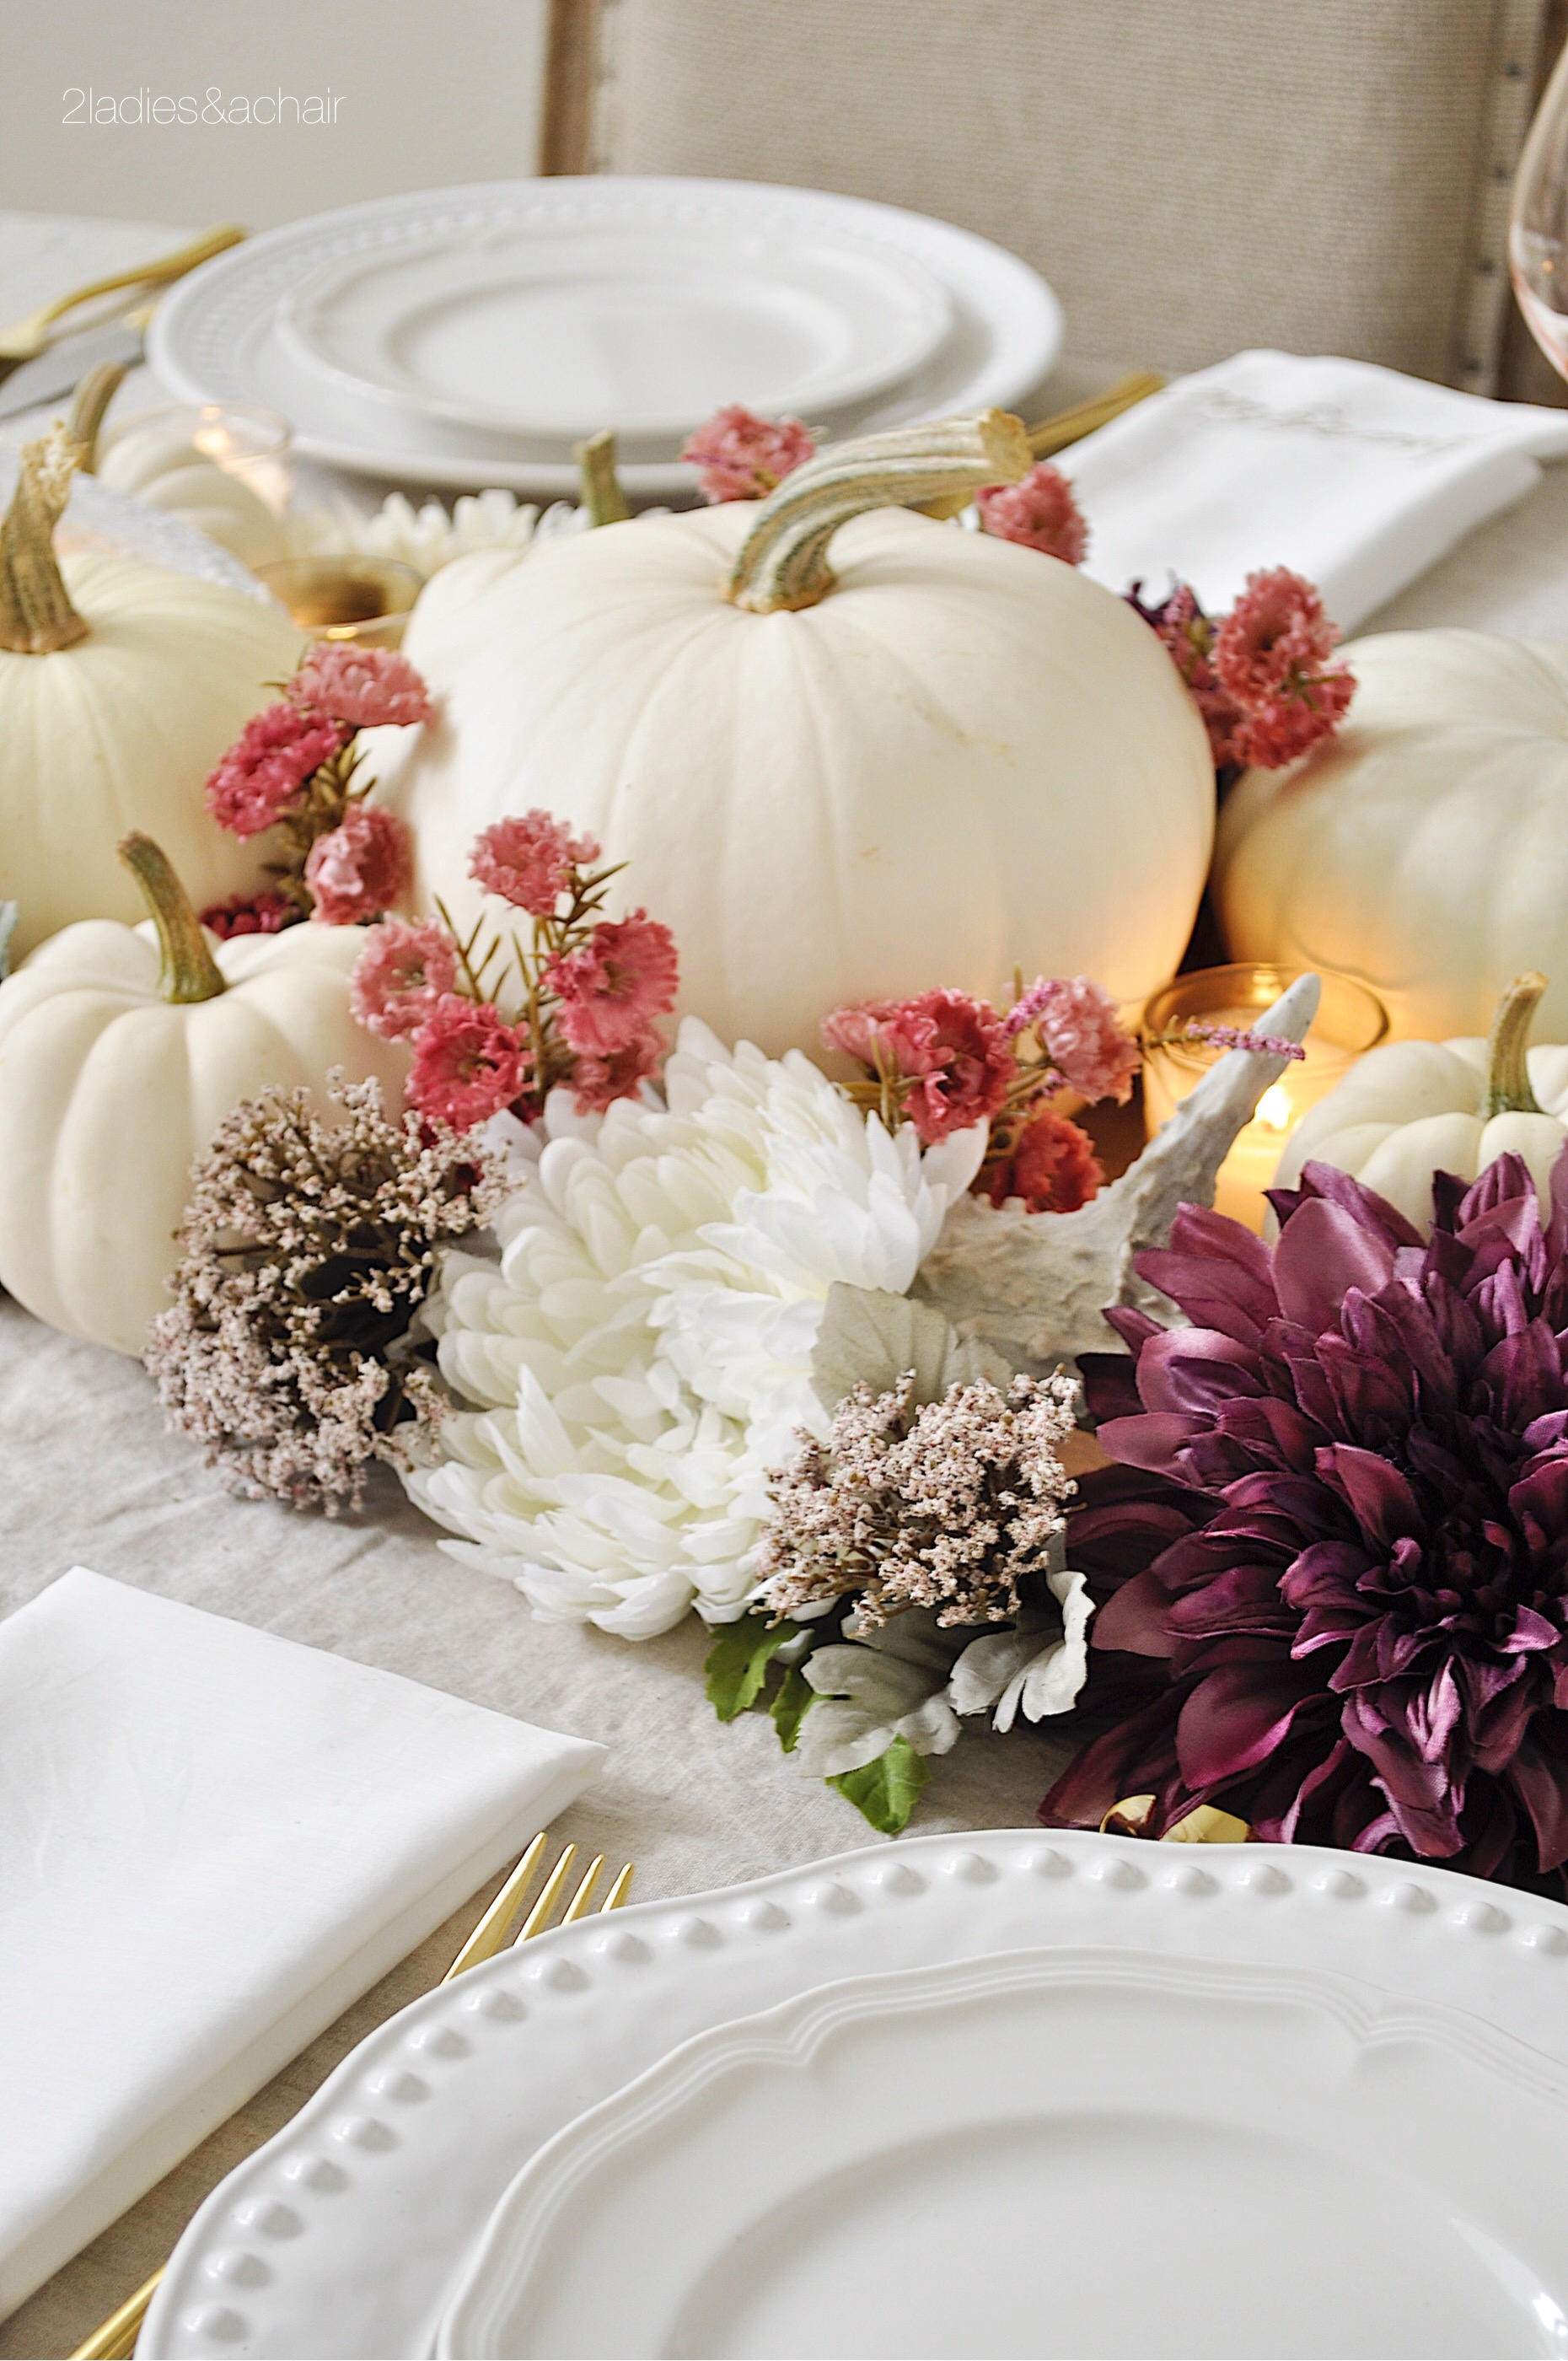 thanksgiving table IMG_8435.JPG